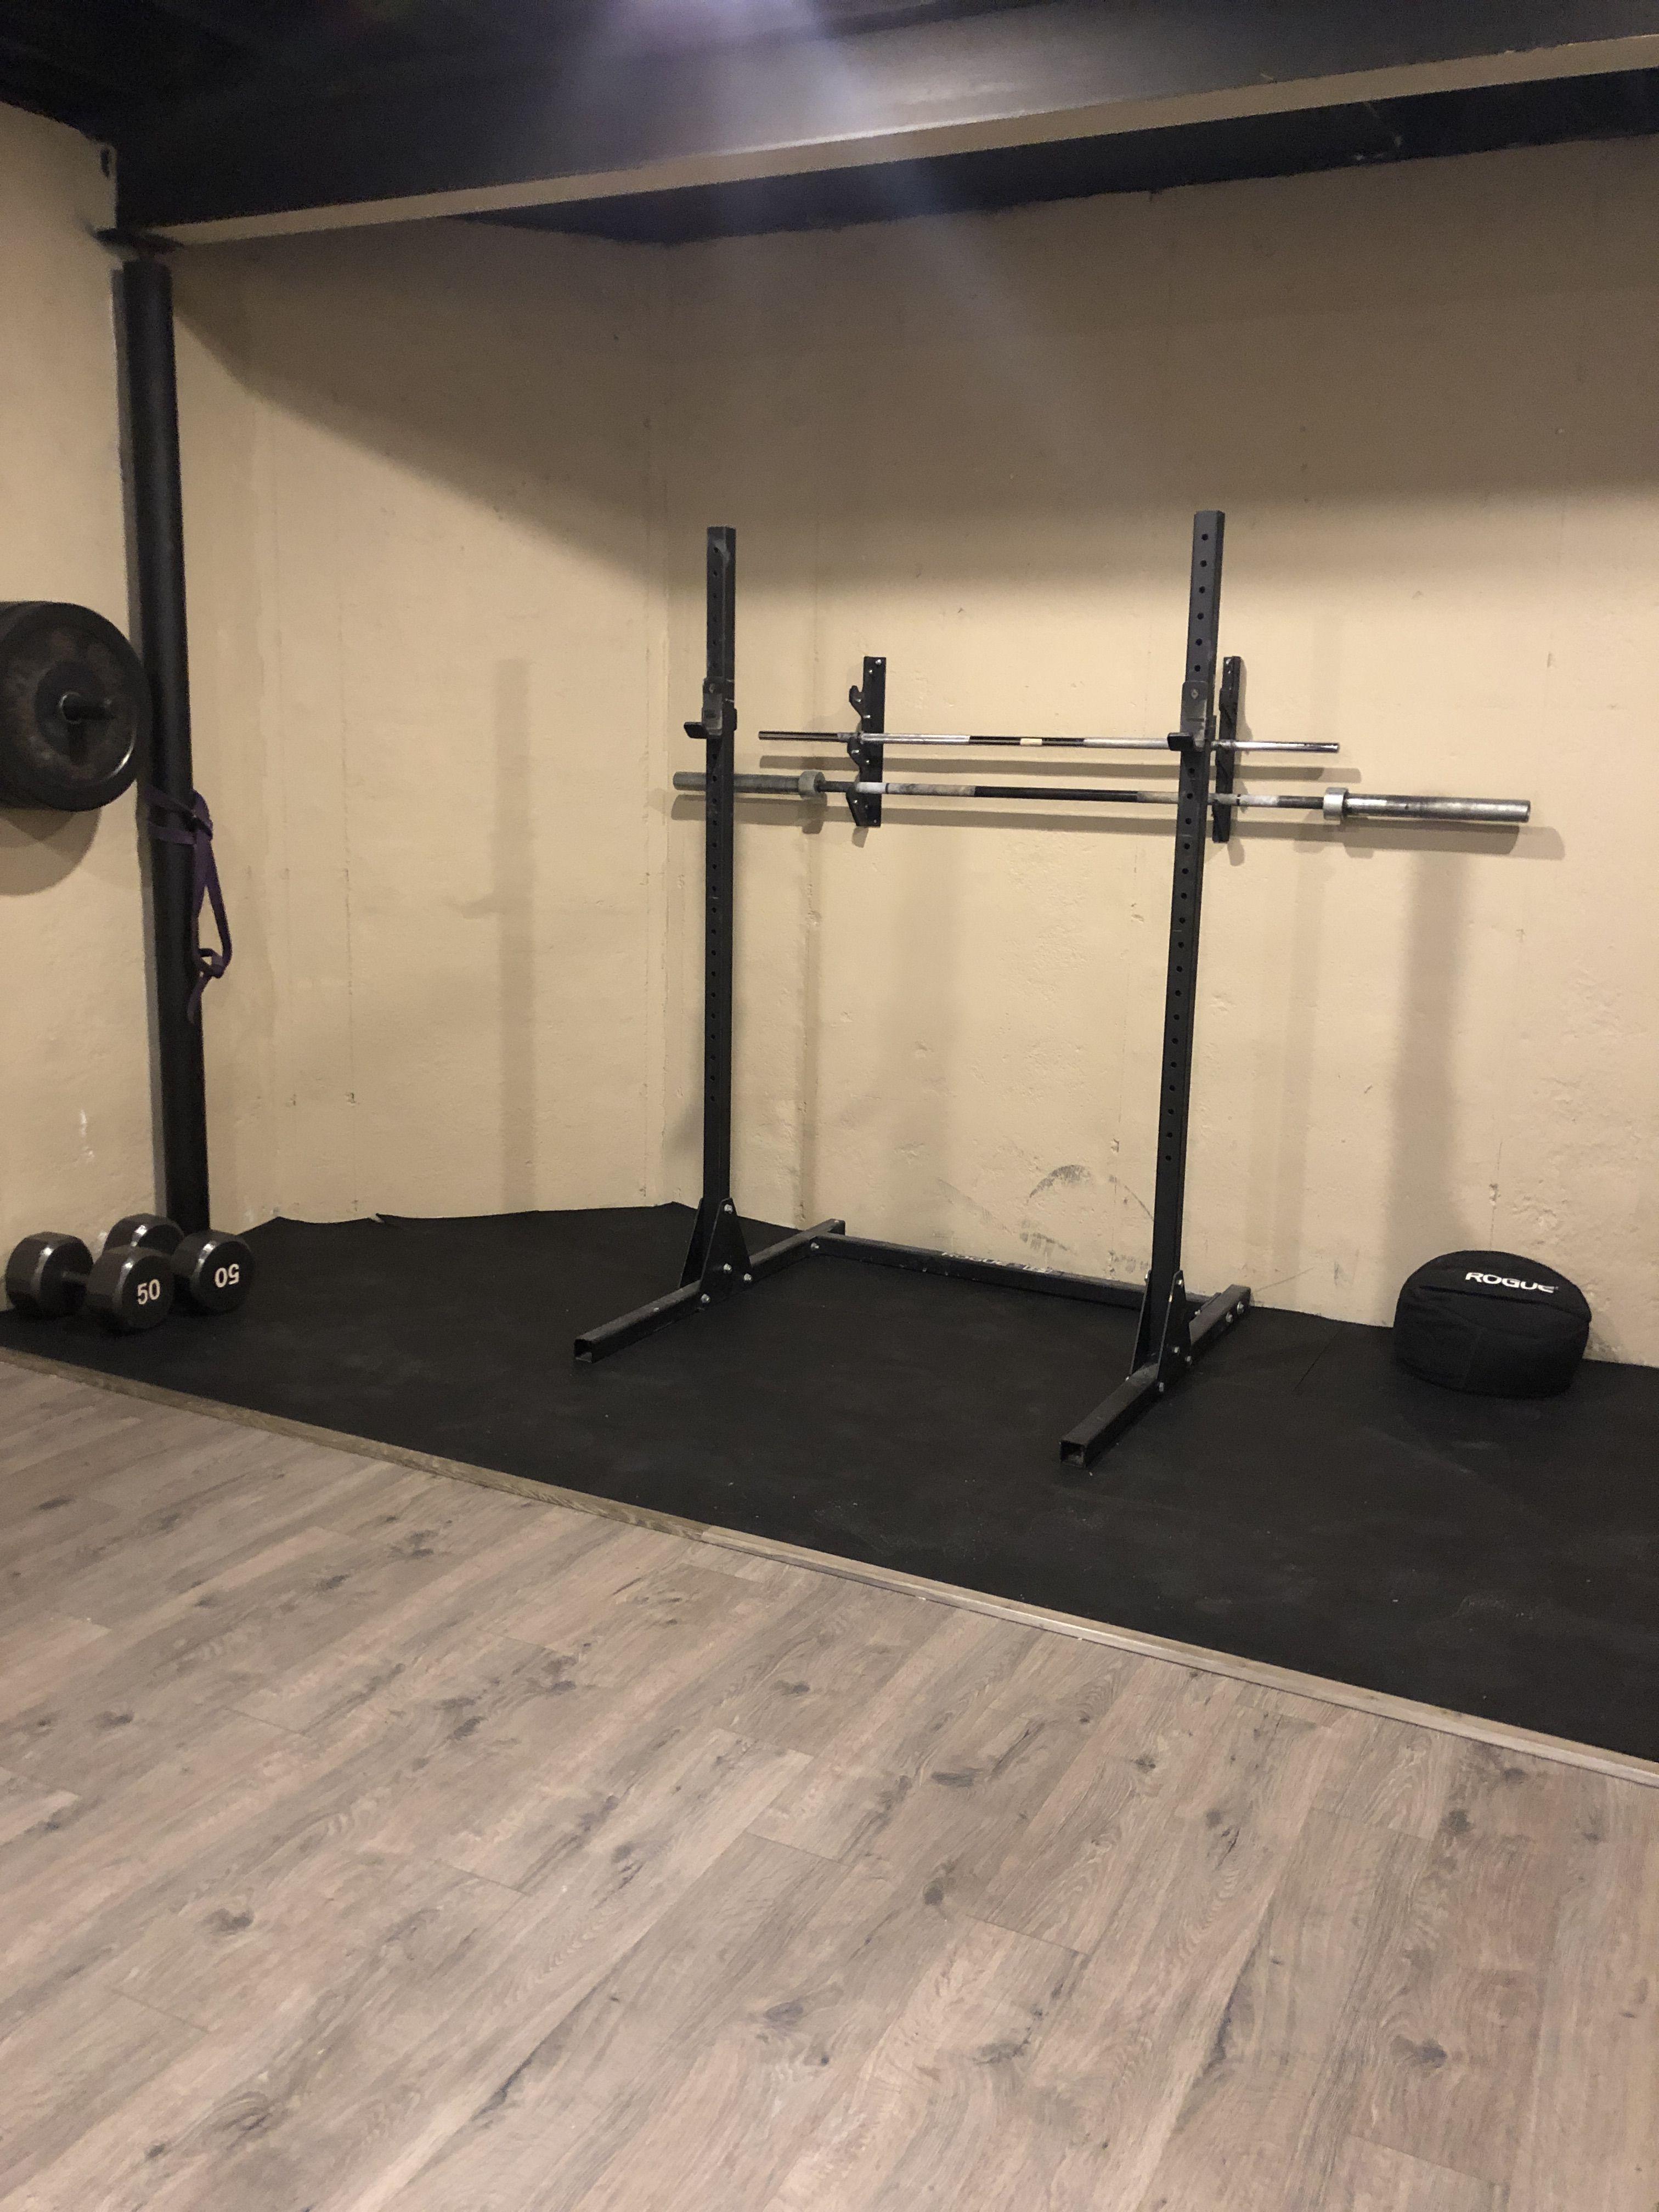 Crossfit And Peloton Room Rubber Flooring Rubber Flooring Basement Basement Gym